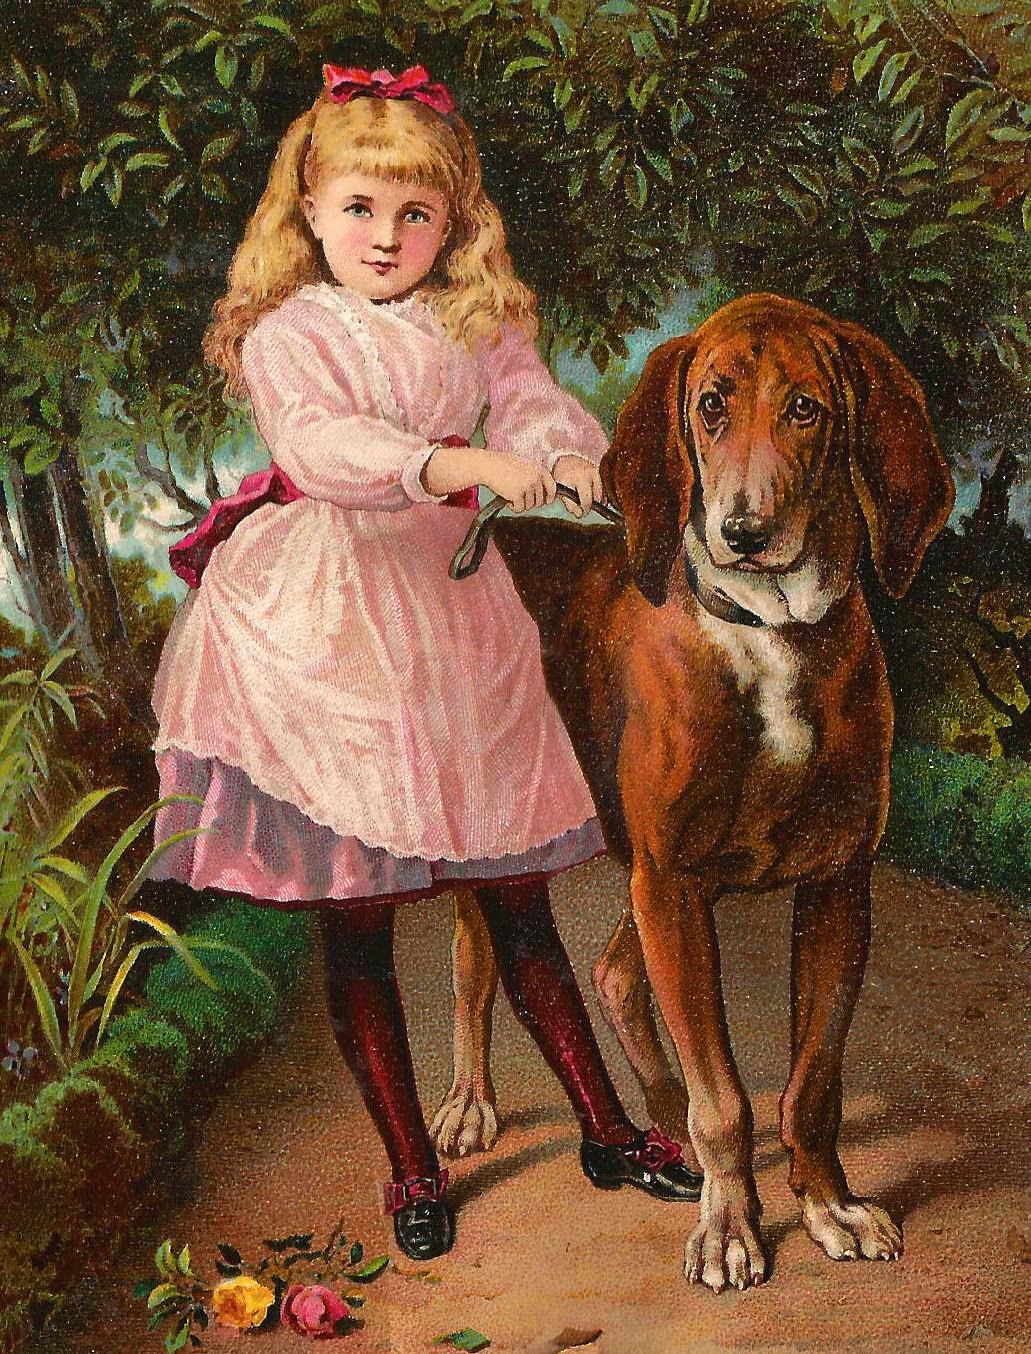 Antique Images: Vintage Digital Girl and Animal Clip Art Victorian ...